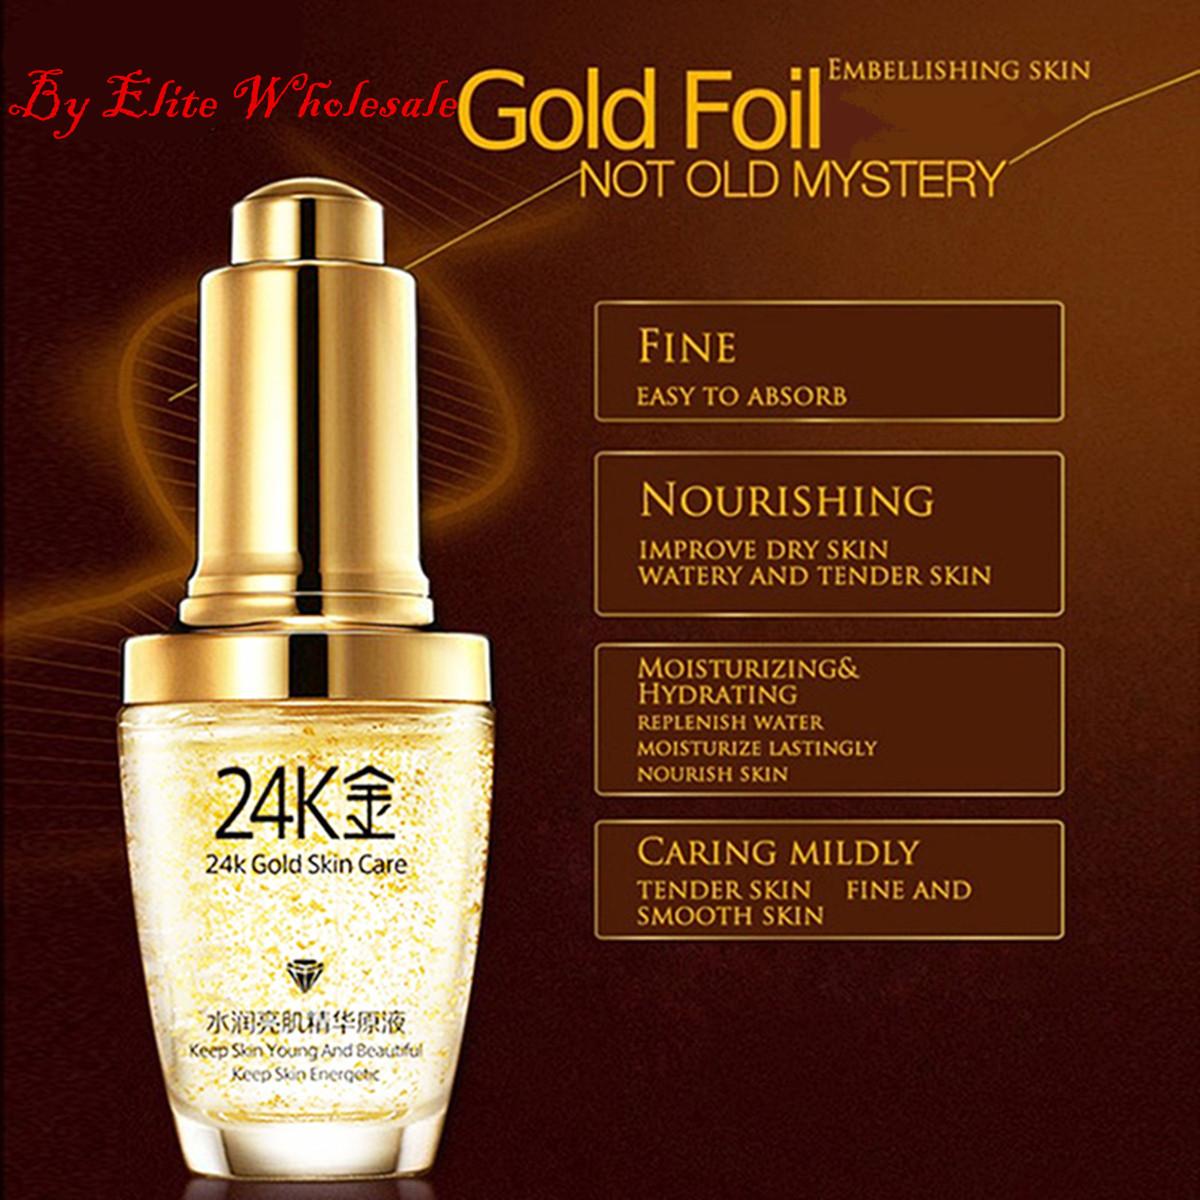 24K Gold Essence Anti-Wrinkle Skin Care Moisturizing Liquid